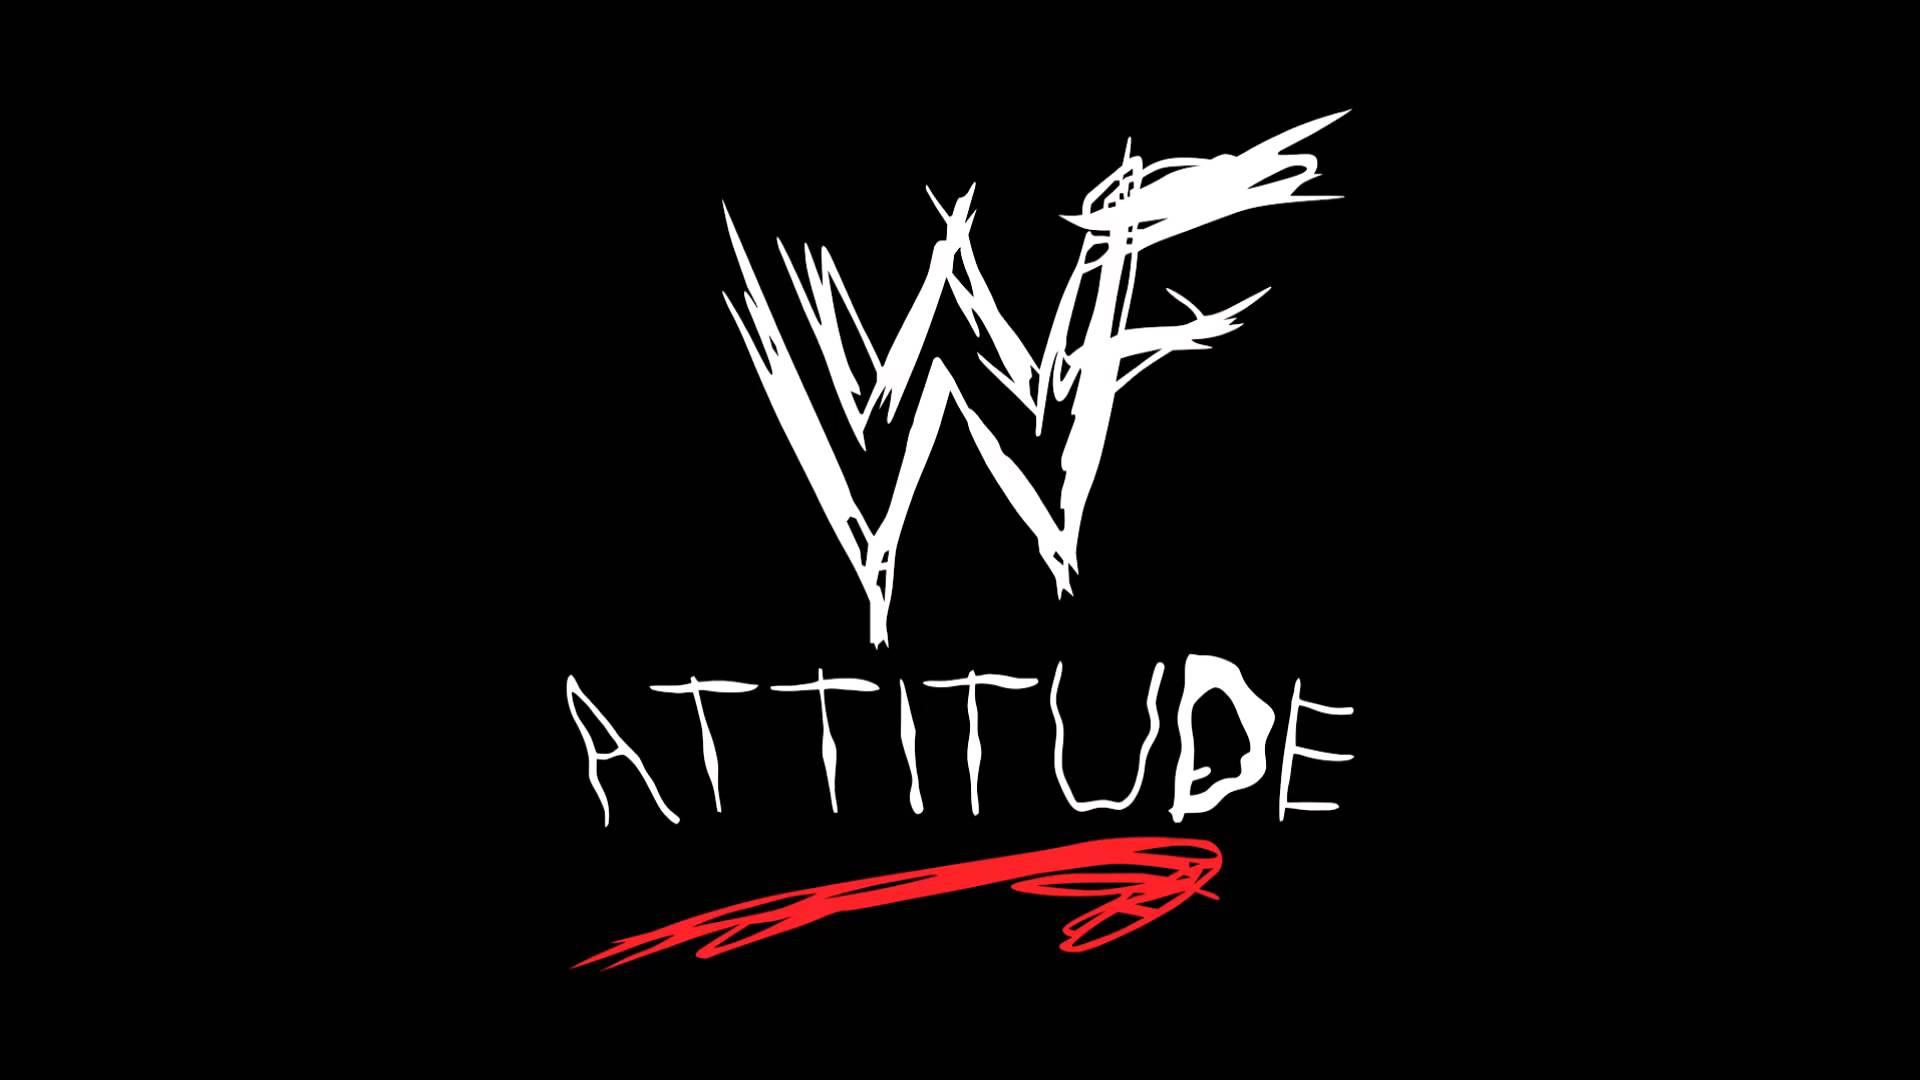 Hd wallpaper attitude - Wwf Wallpaper